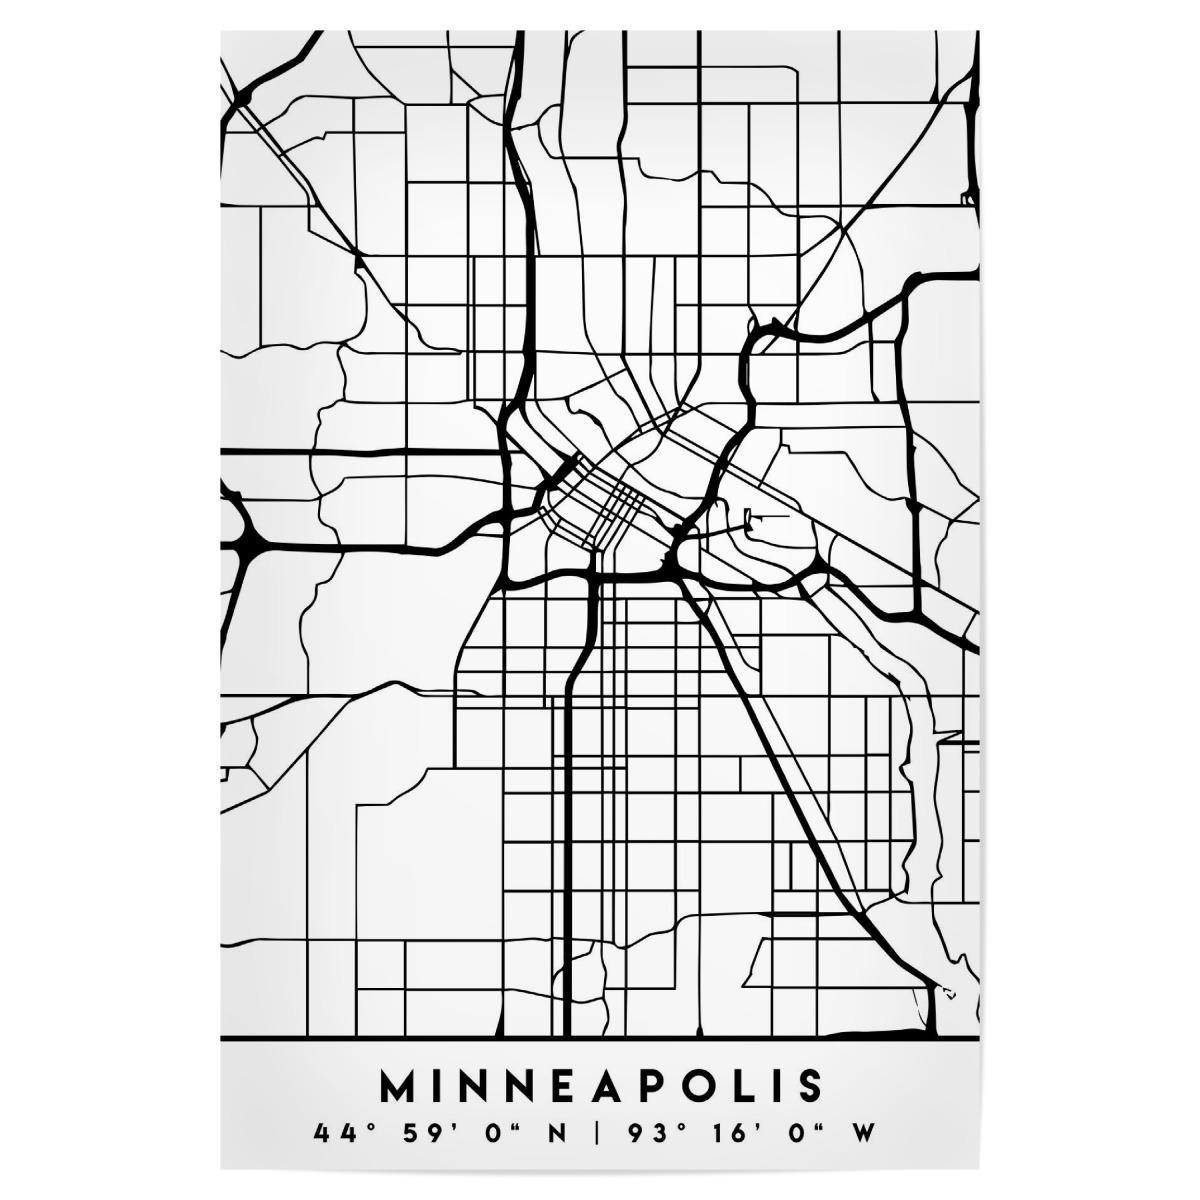 MINNEAPOLIS MINNESOTA CITY MAP als Poster bei artboxONE kaufen